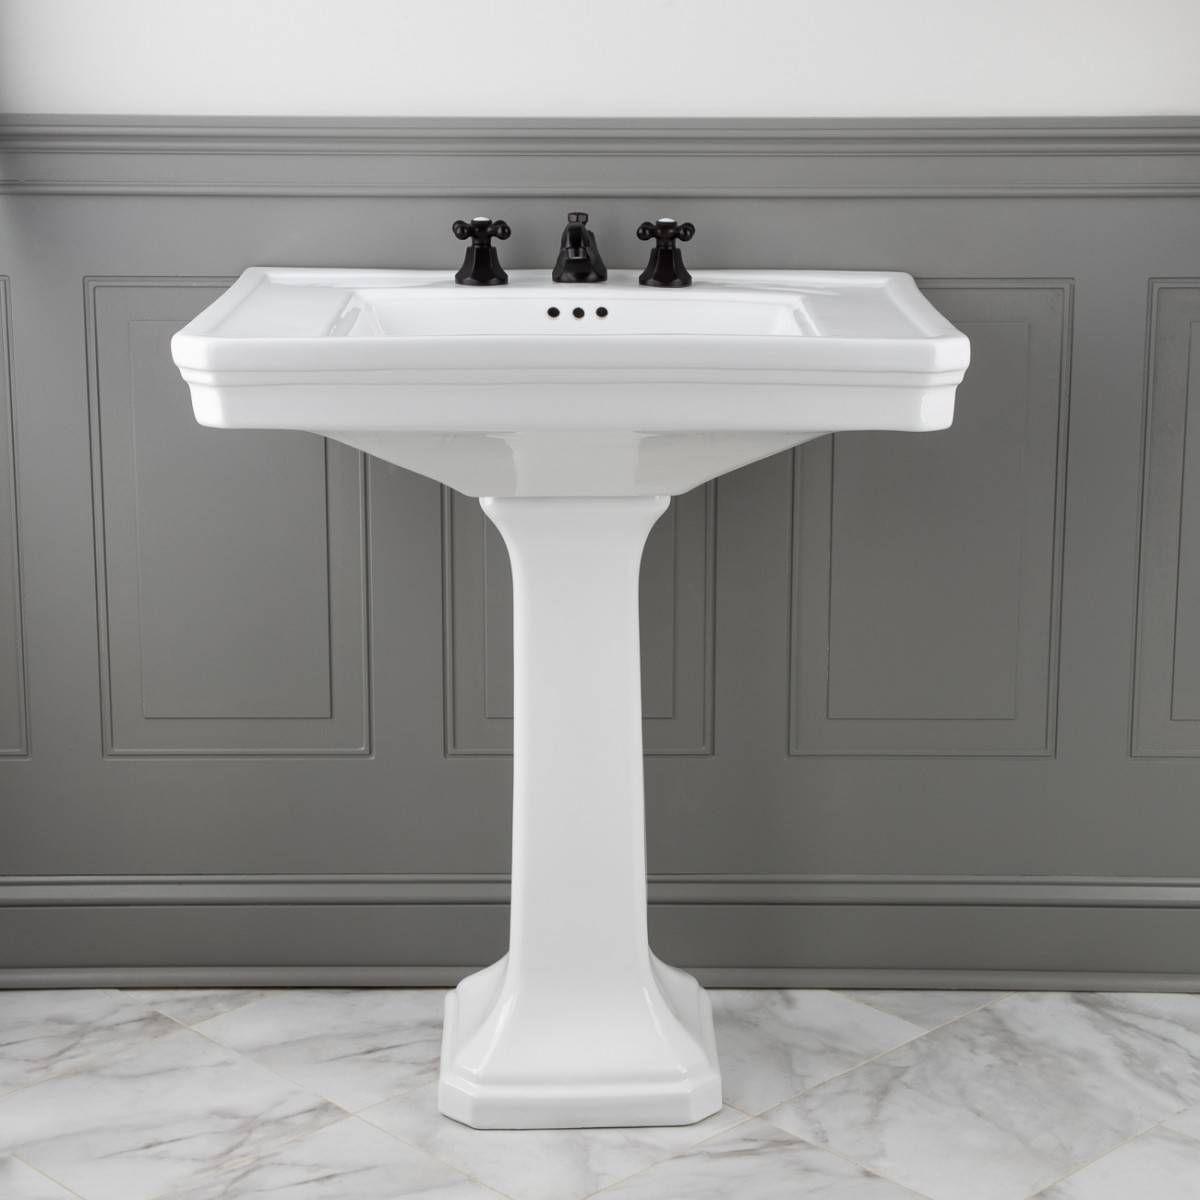 Randolph Morris 30 Pedestal Sink Rmc1315 Pedestal Sink